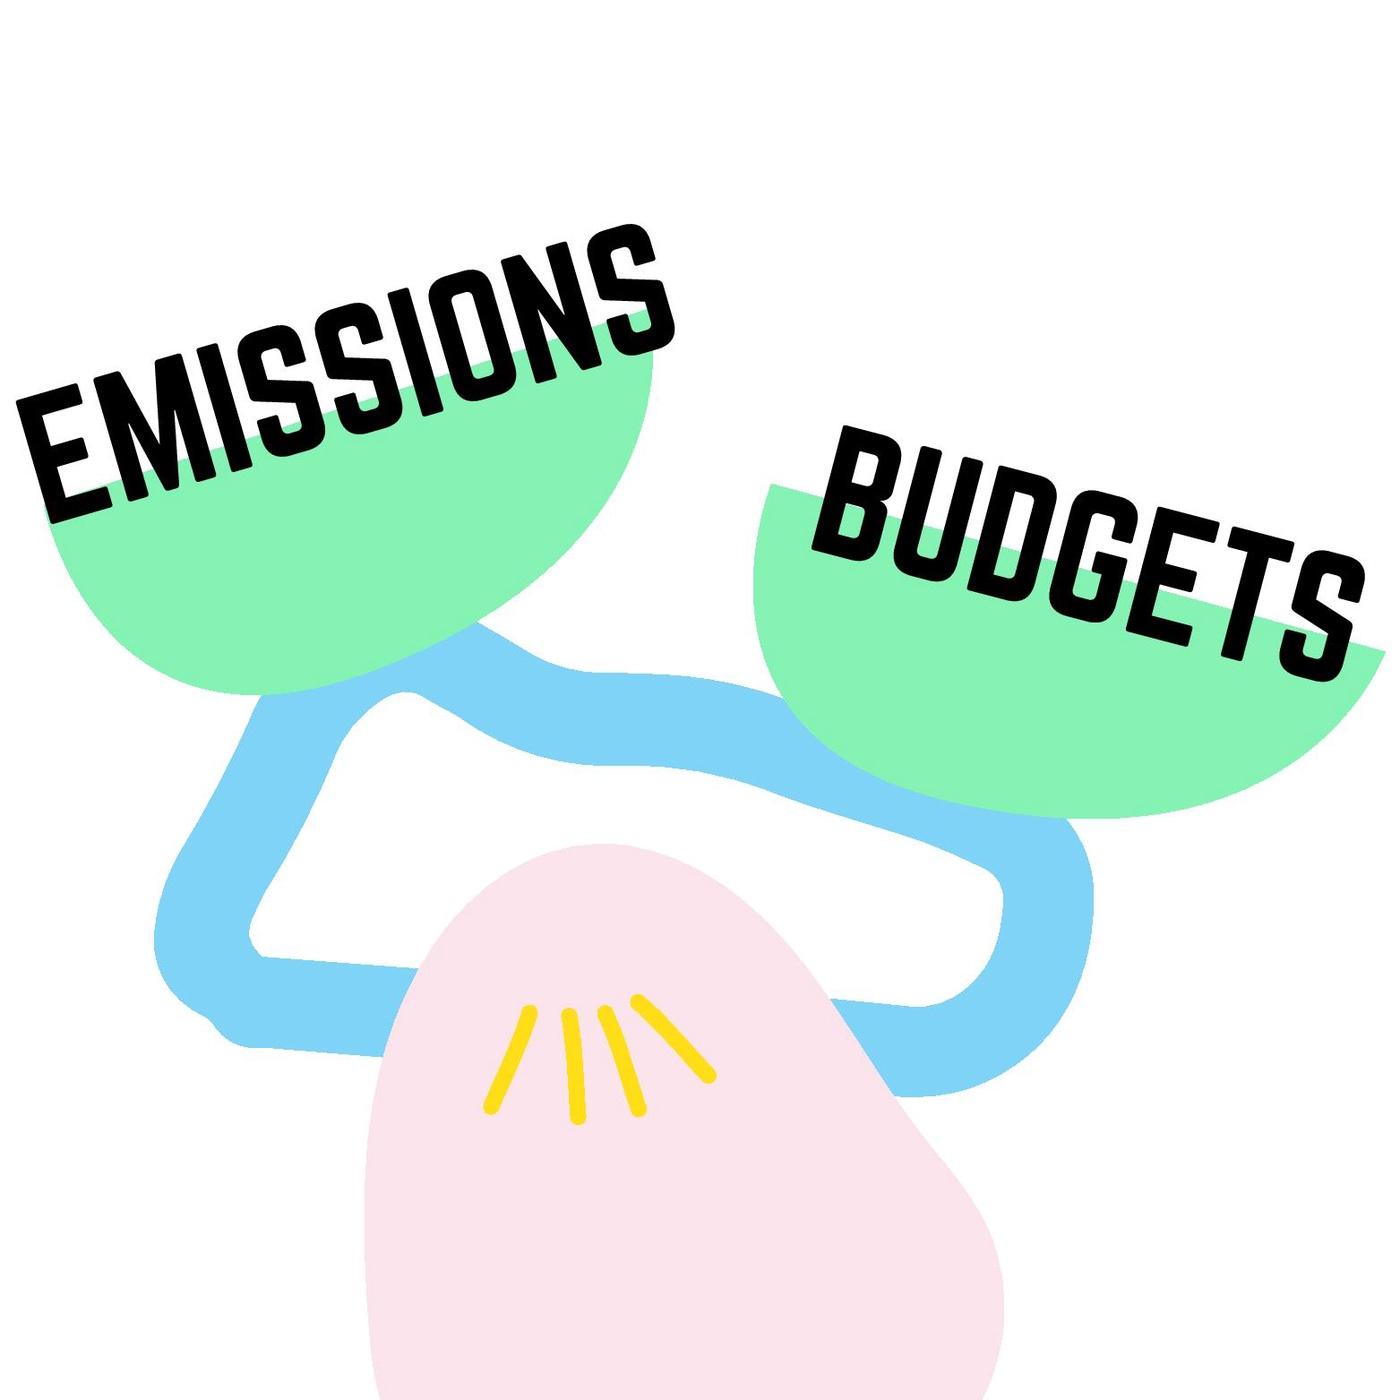 Individuelle Emissionsbudgets - geht das?